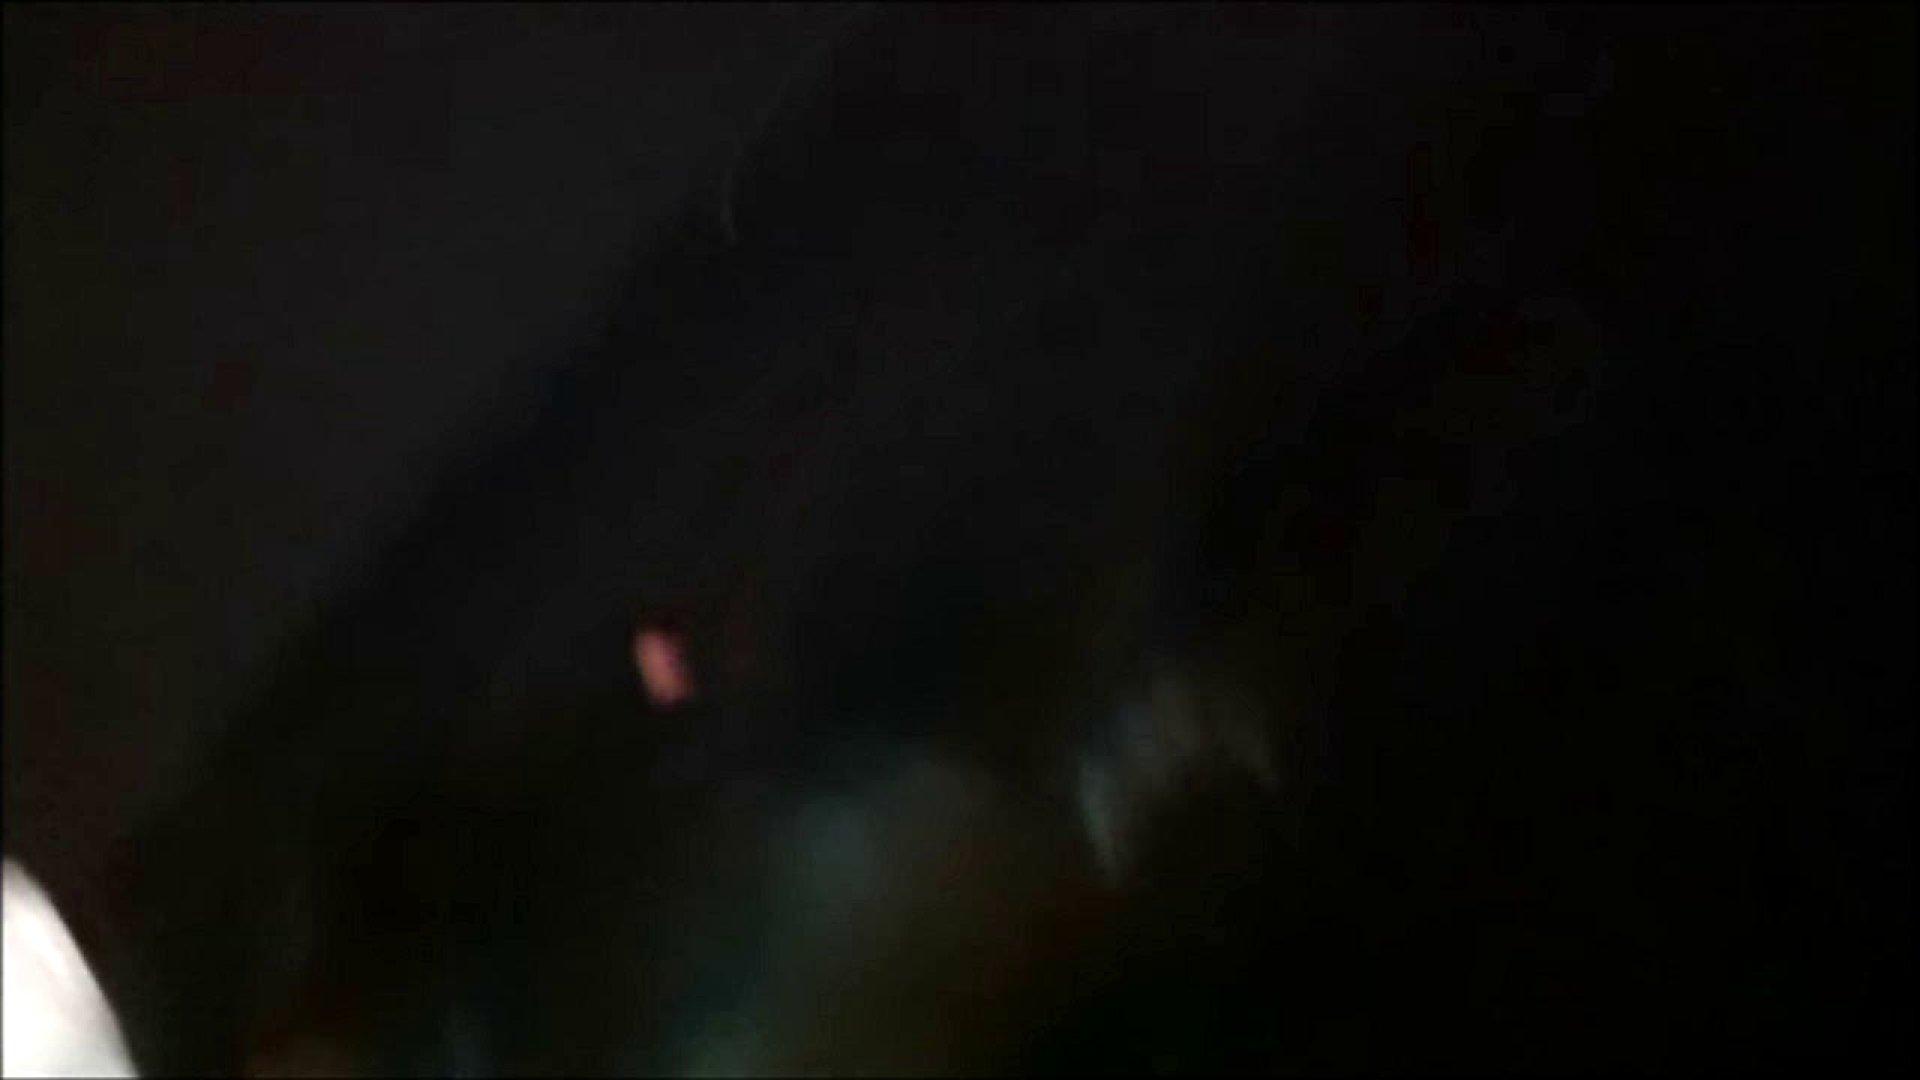 vol.18 【NSちゃん(2回目)】エステティシャン23歳 完全体成功! イタズラ特集 | 知人のセックス  49PIX